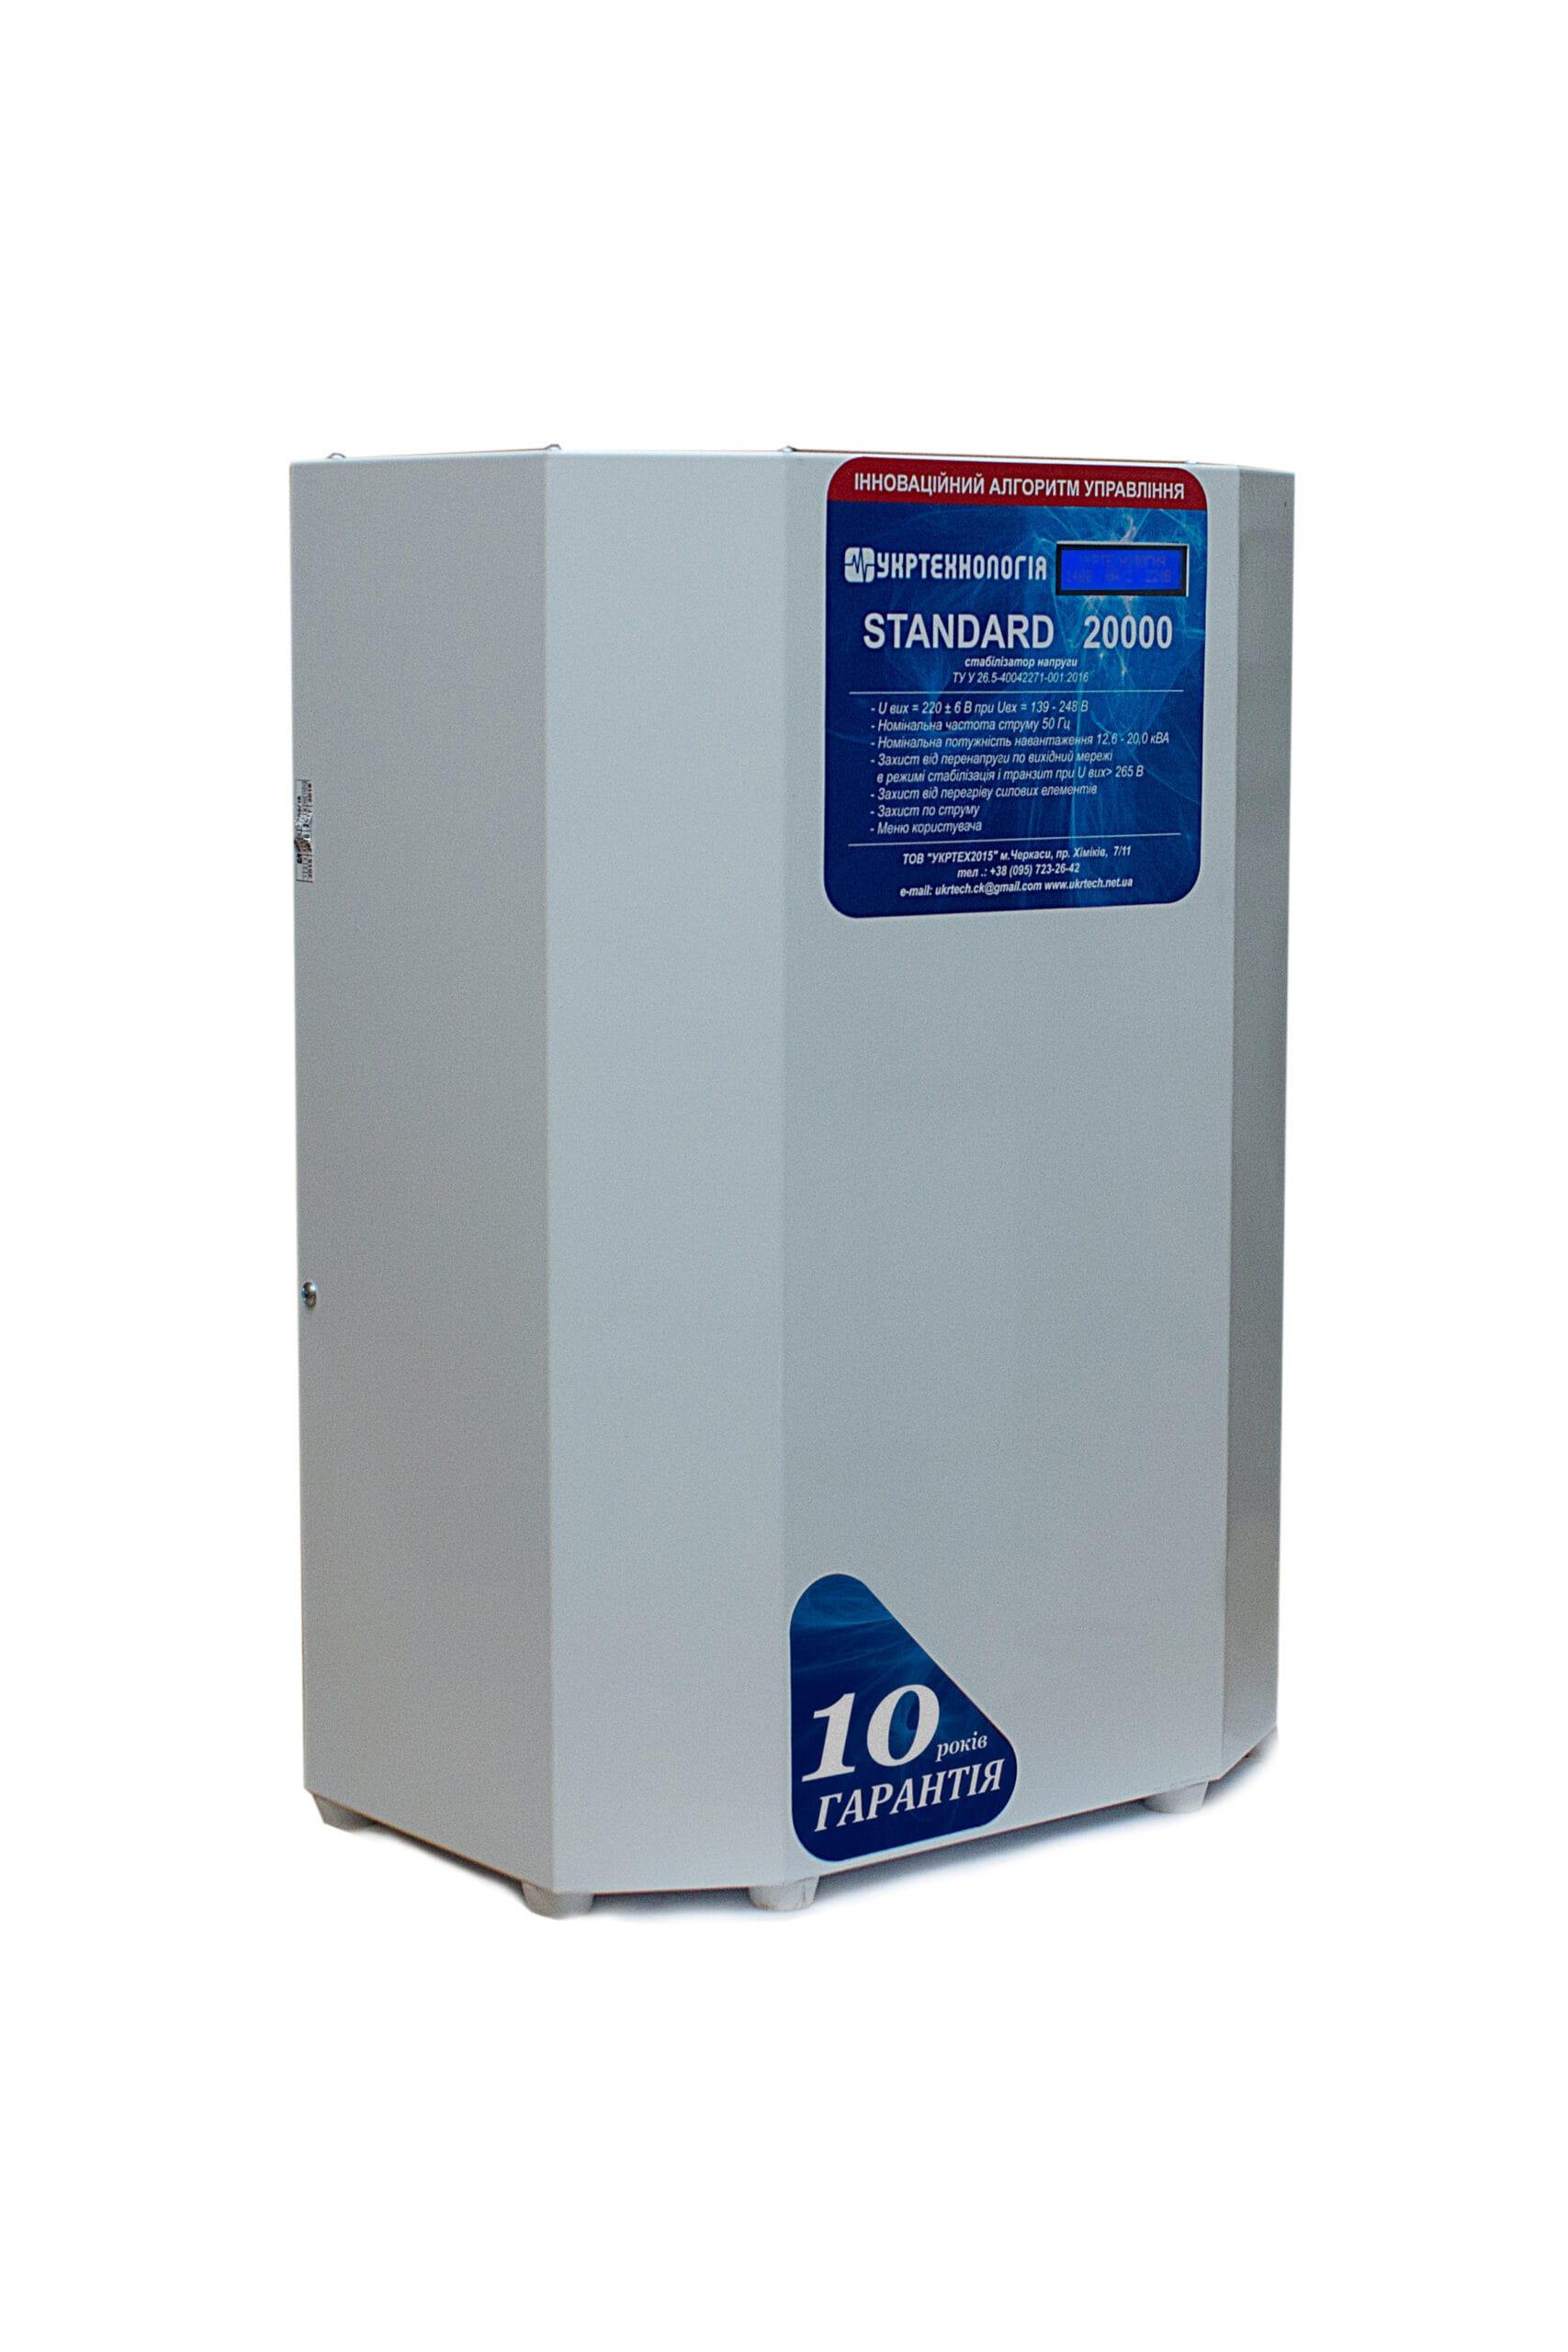 Стабилизаторы напряжения - Стабилизатор напряжения 20 кВт STANDARD  000001401 - Фото 2